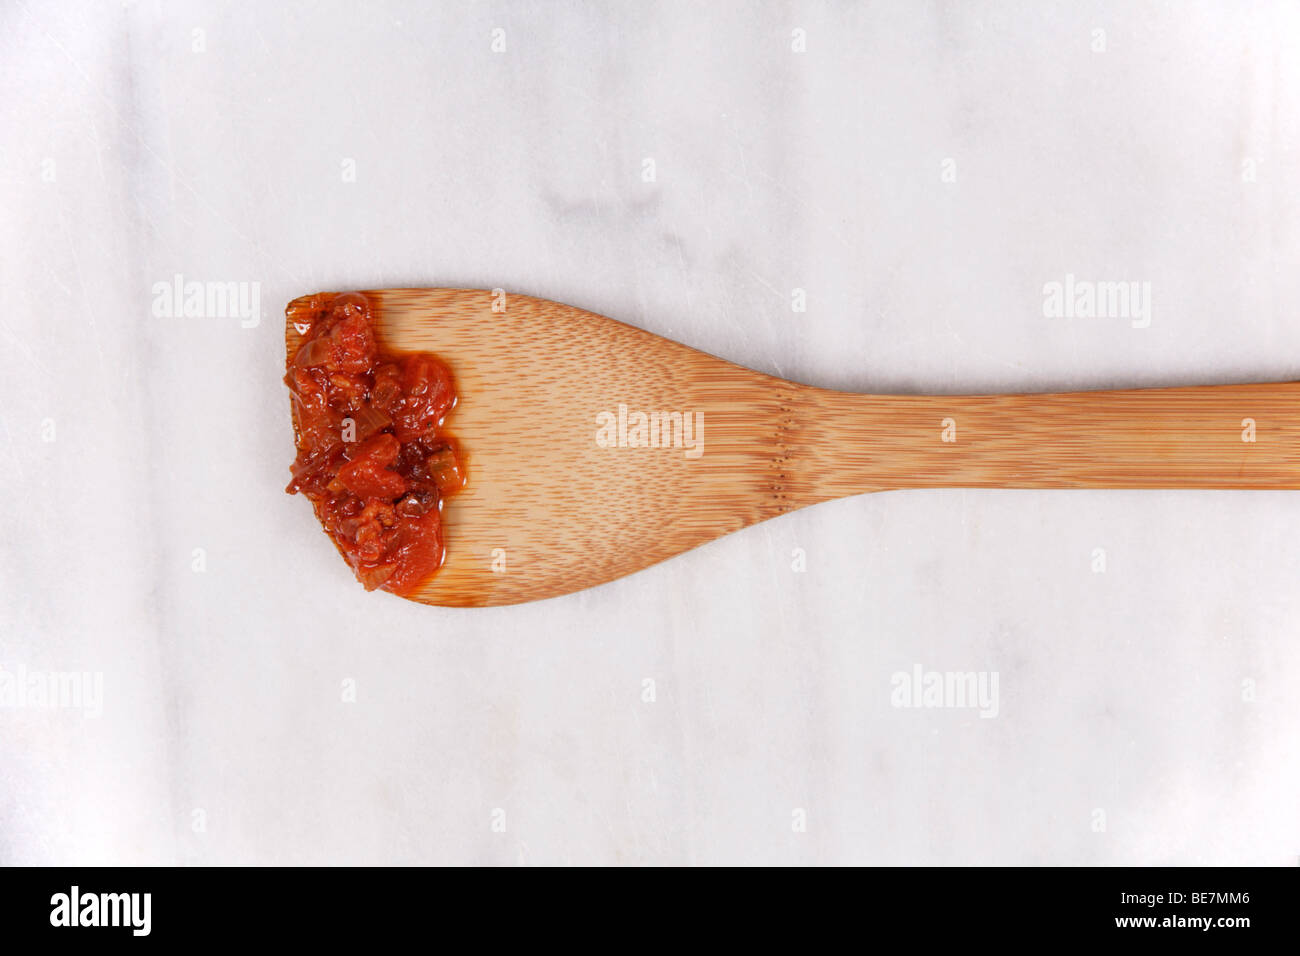 Tomato fondue sauce on a wooden spatula - Stock Image